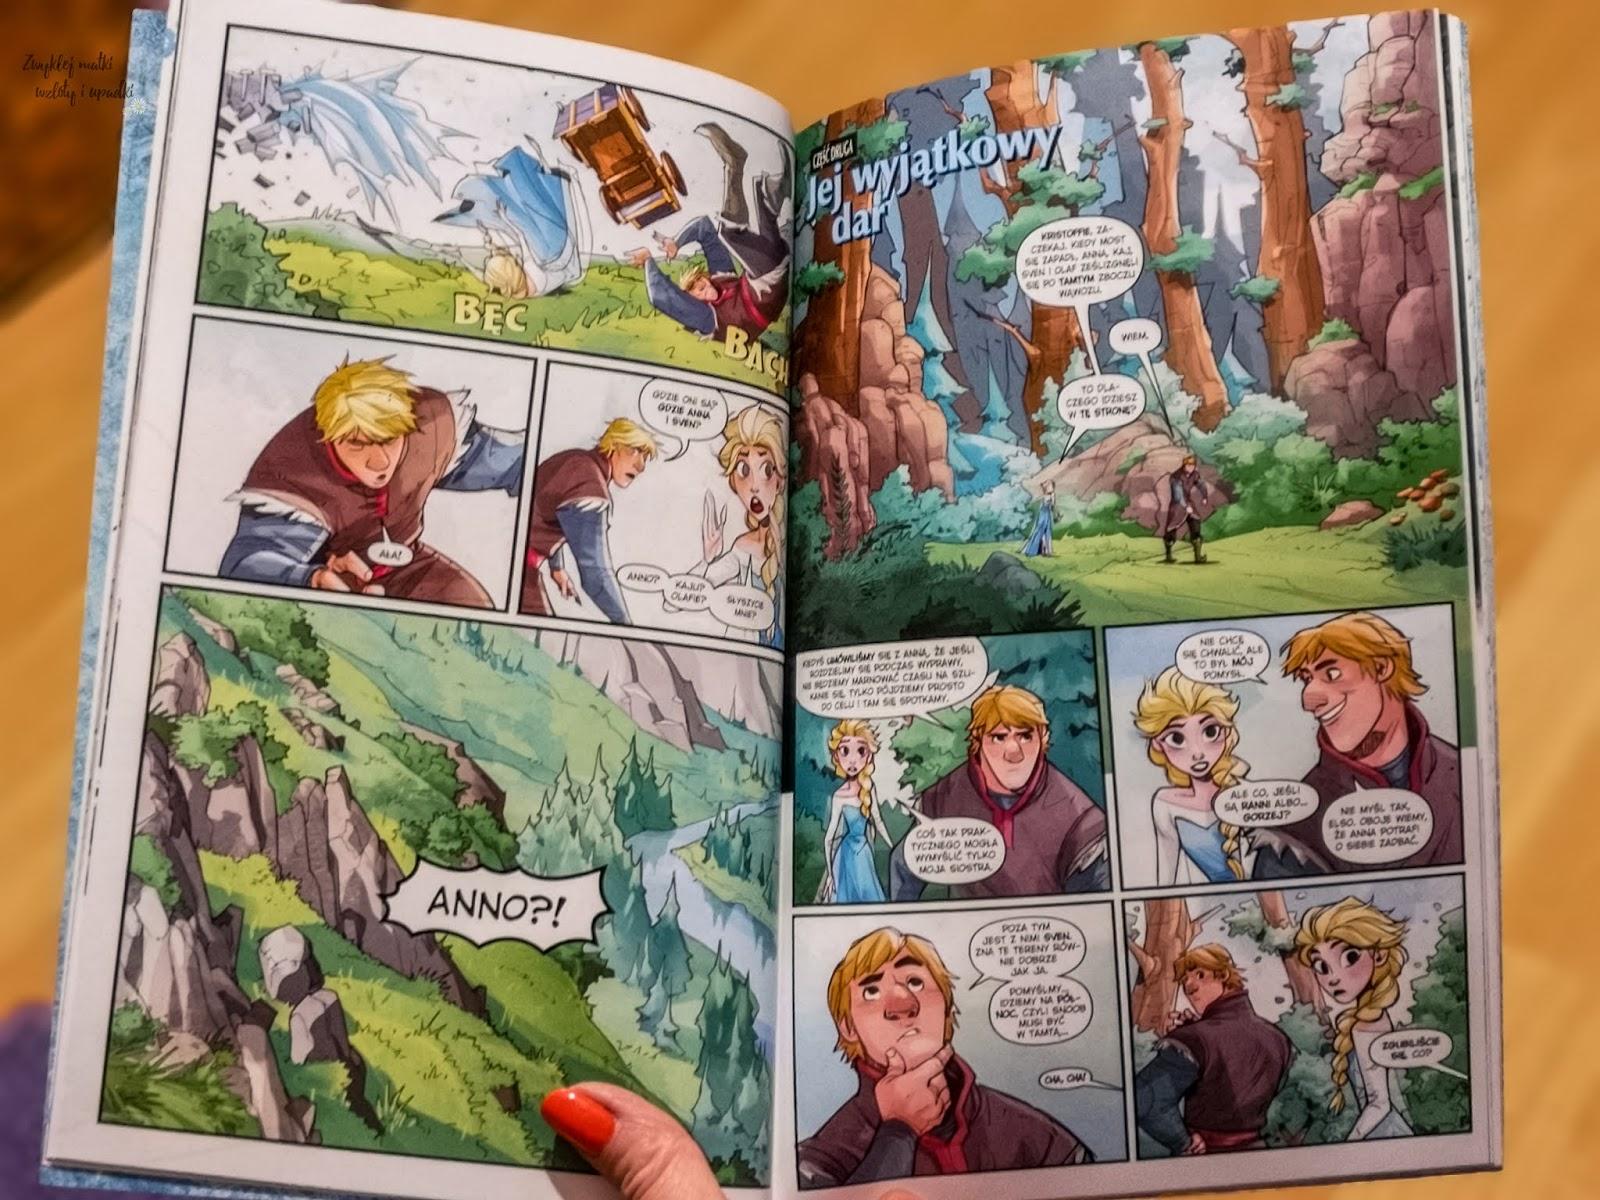 Komiksy - na święta jak znalazł